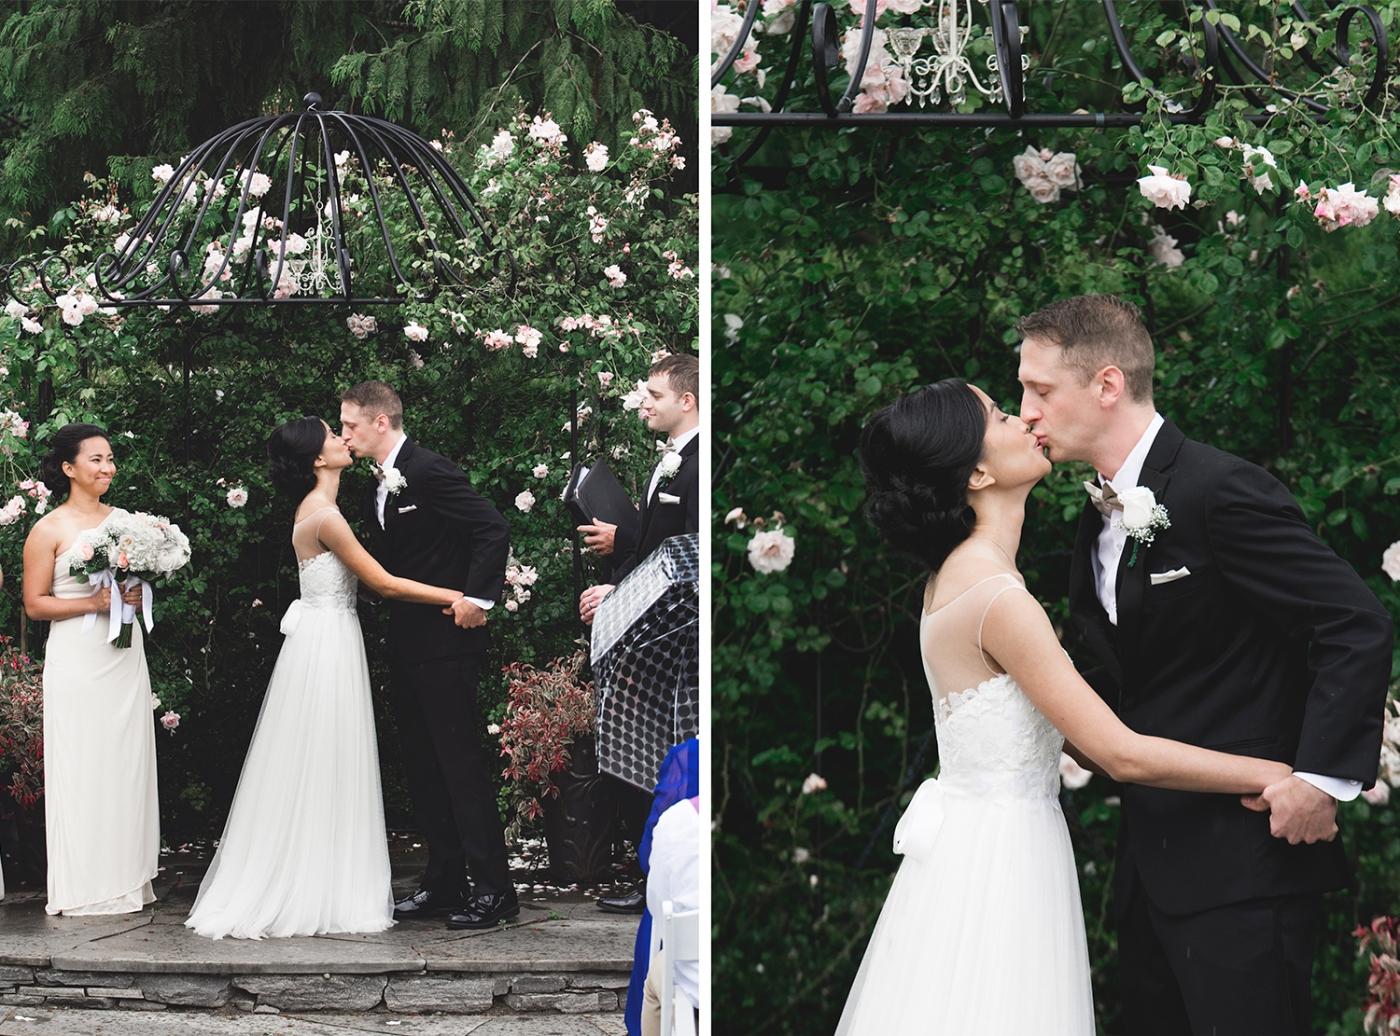 Jane_Speleers_2016_Details_Wedding_Wild_Rose_Estates_Venue_JS7_7807 copy